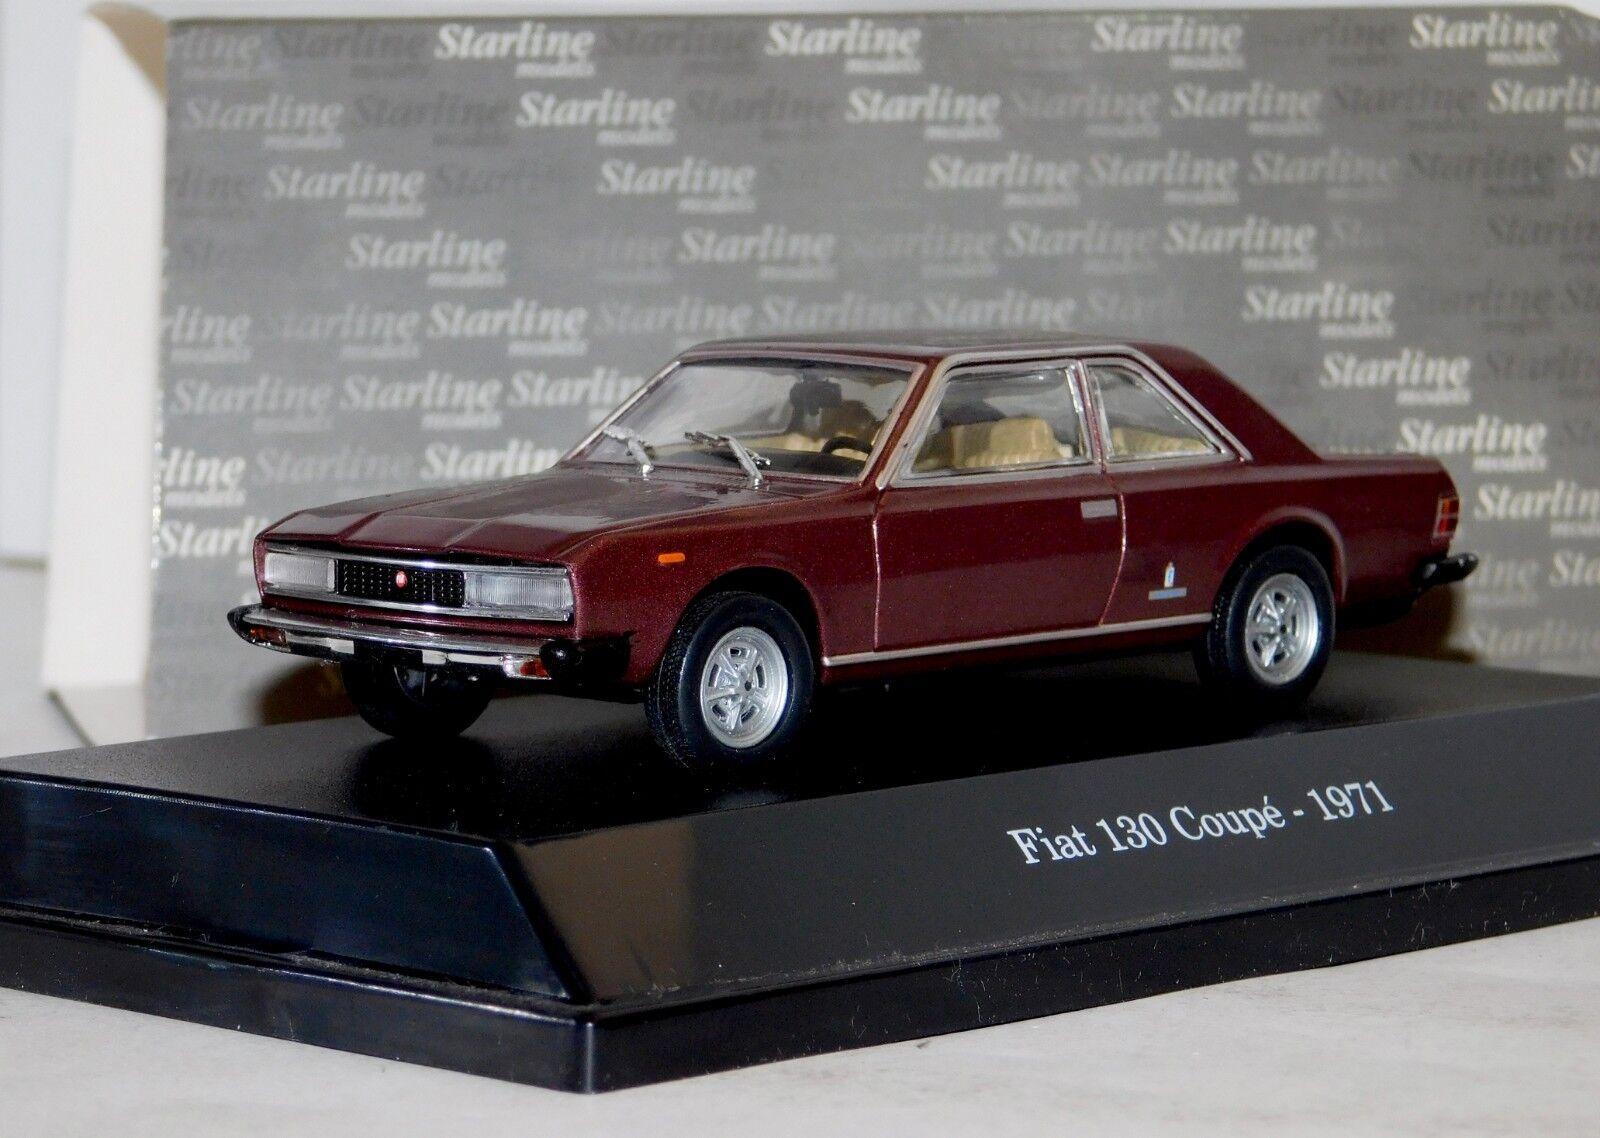 FIAT FIAT FIAT 130 COUPE 1971 STARLINE 1 43 281cad